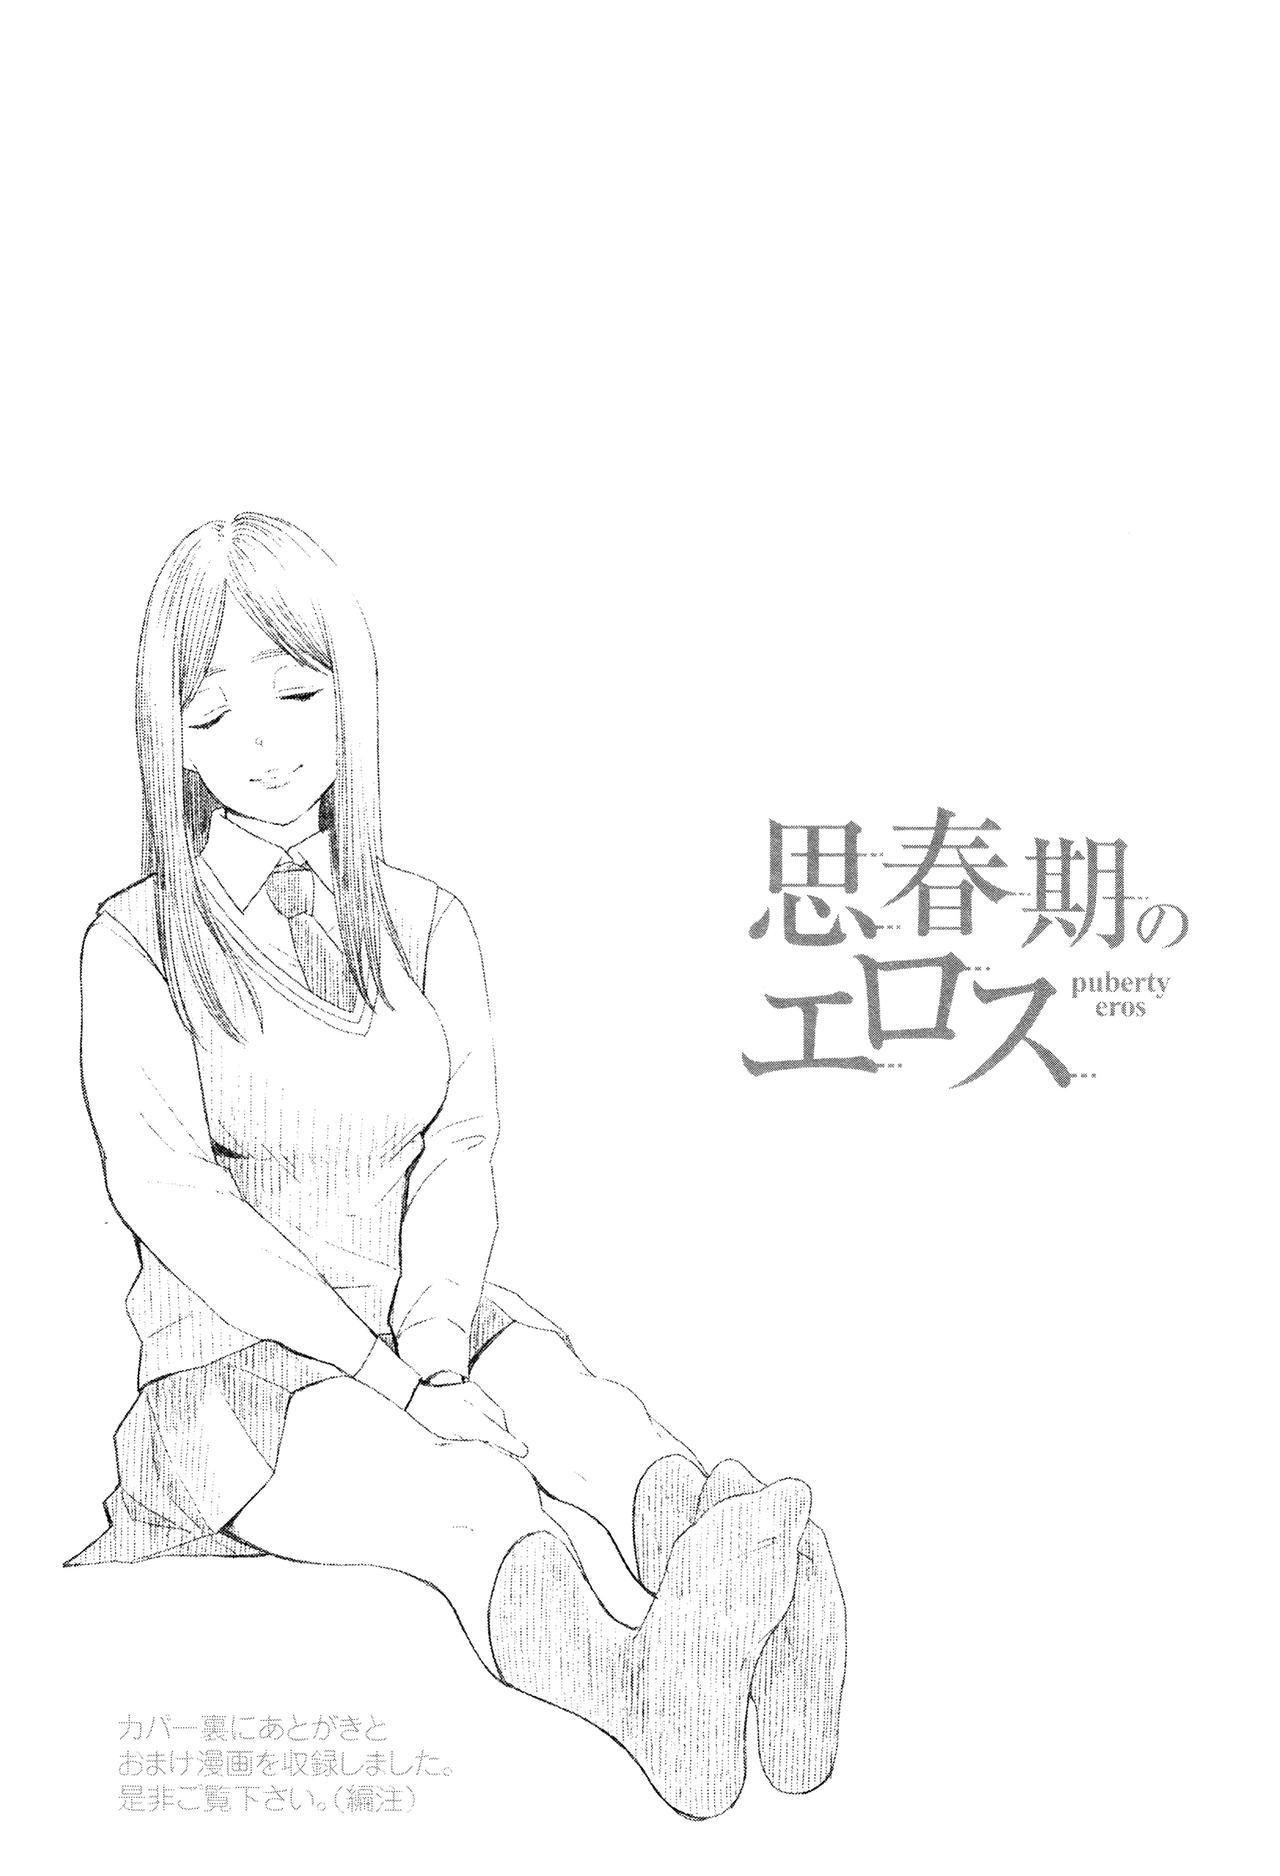 Shishunki no Eros - puberty eros 177